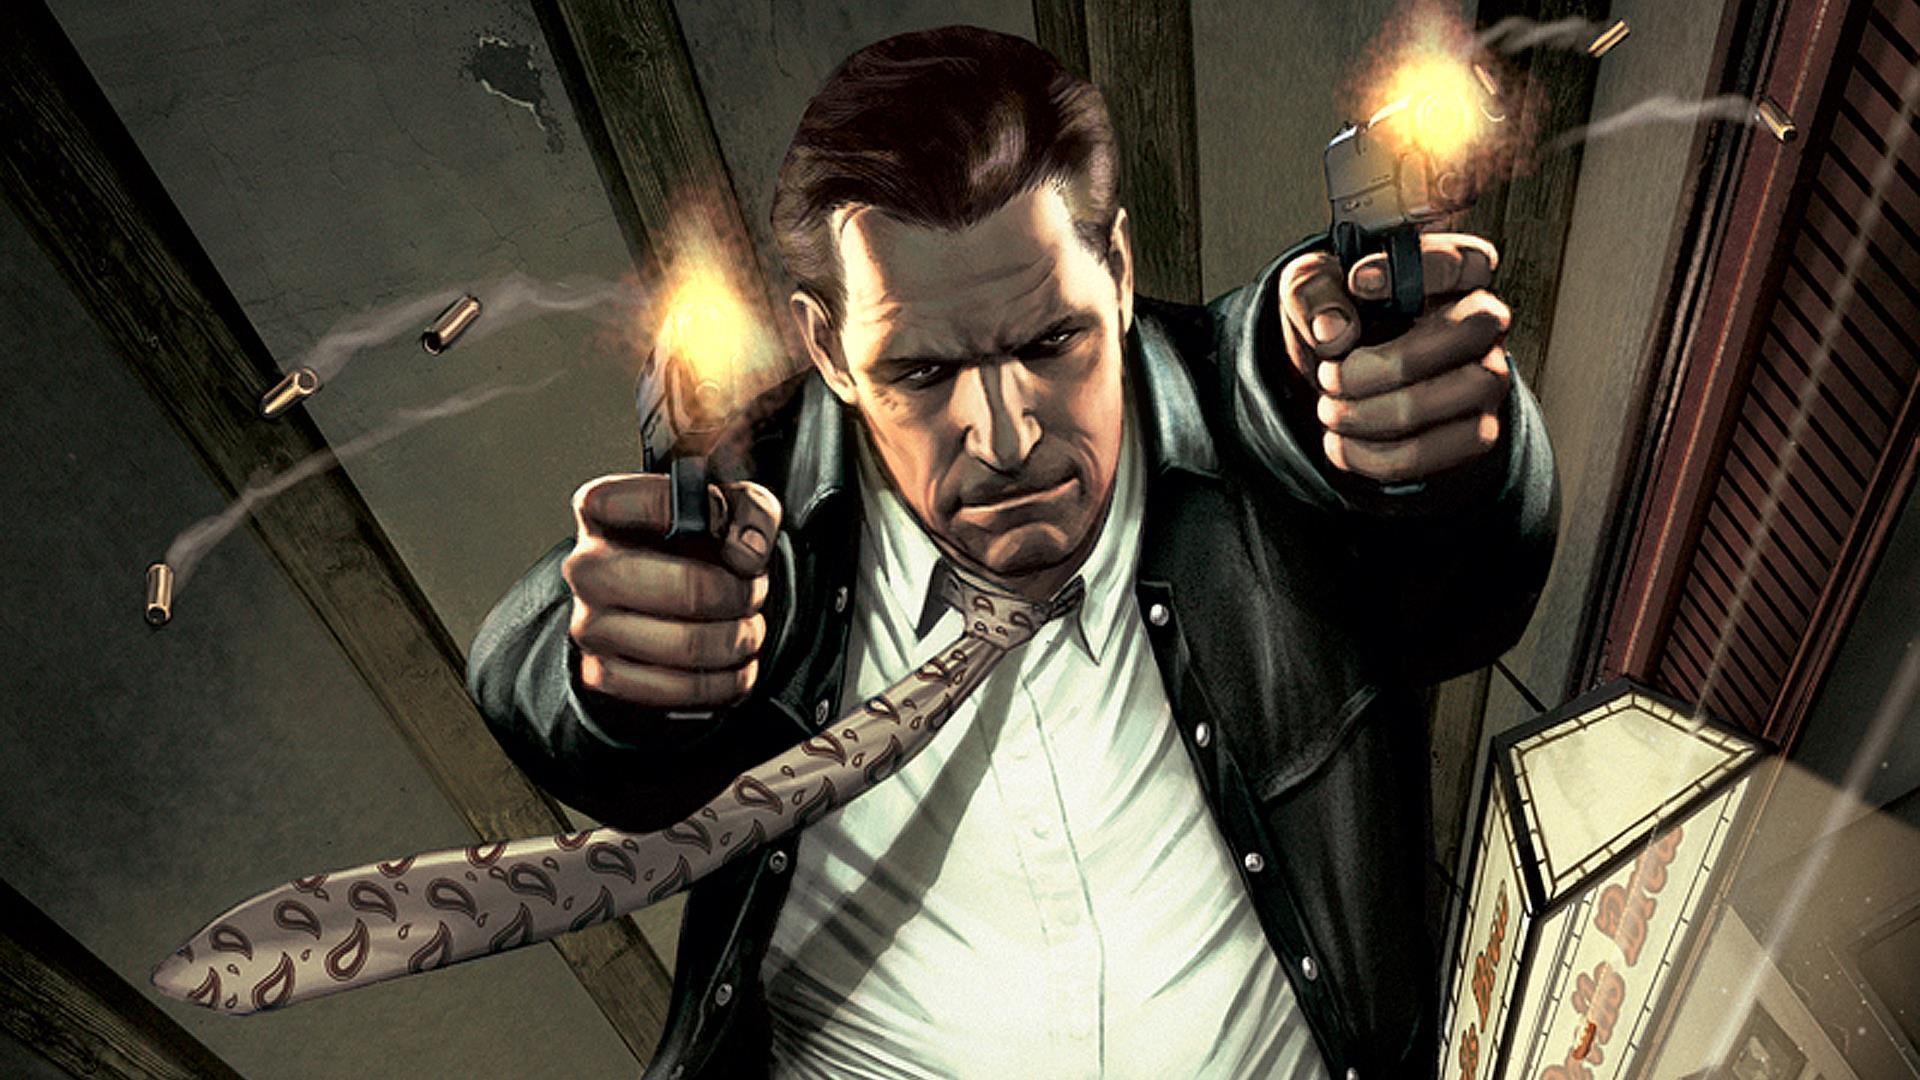 Max Payne HD desktop wallpaper High Definition Fullscreen